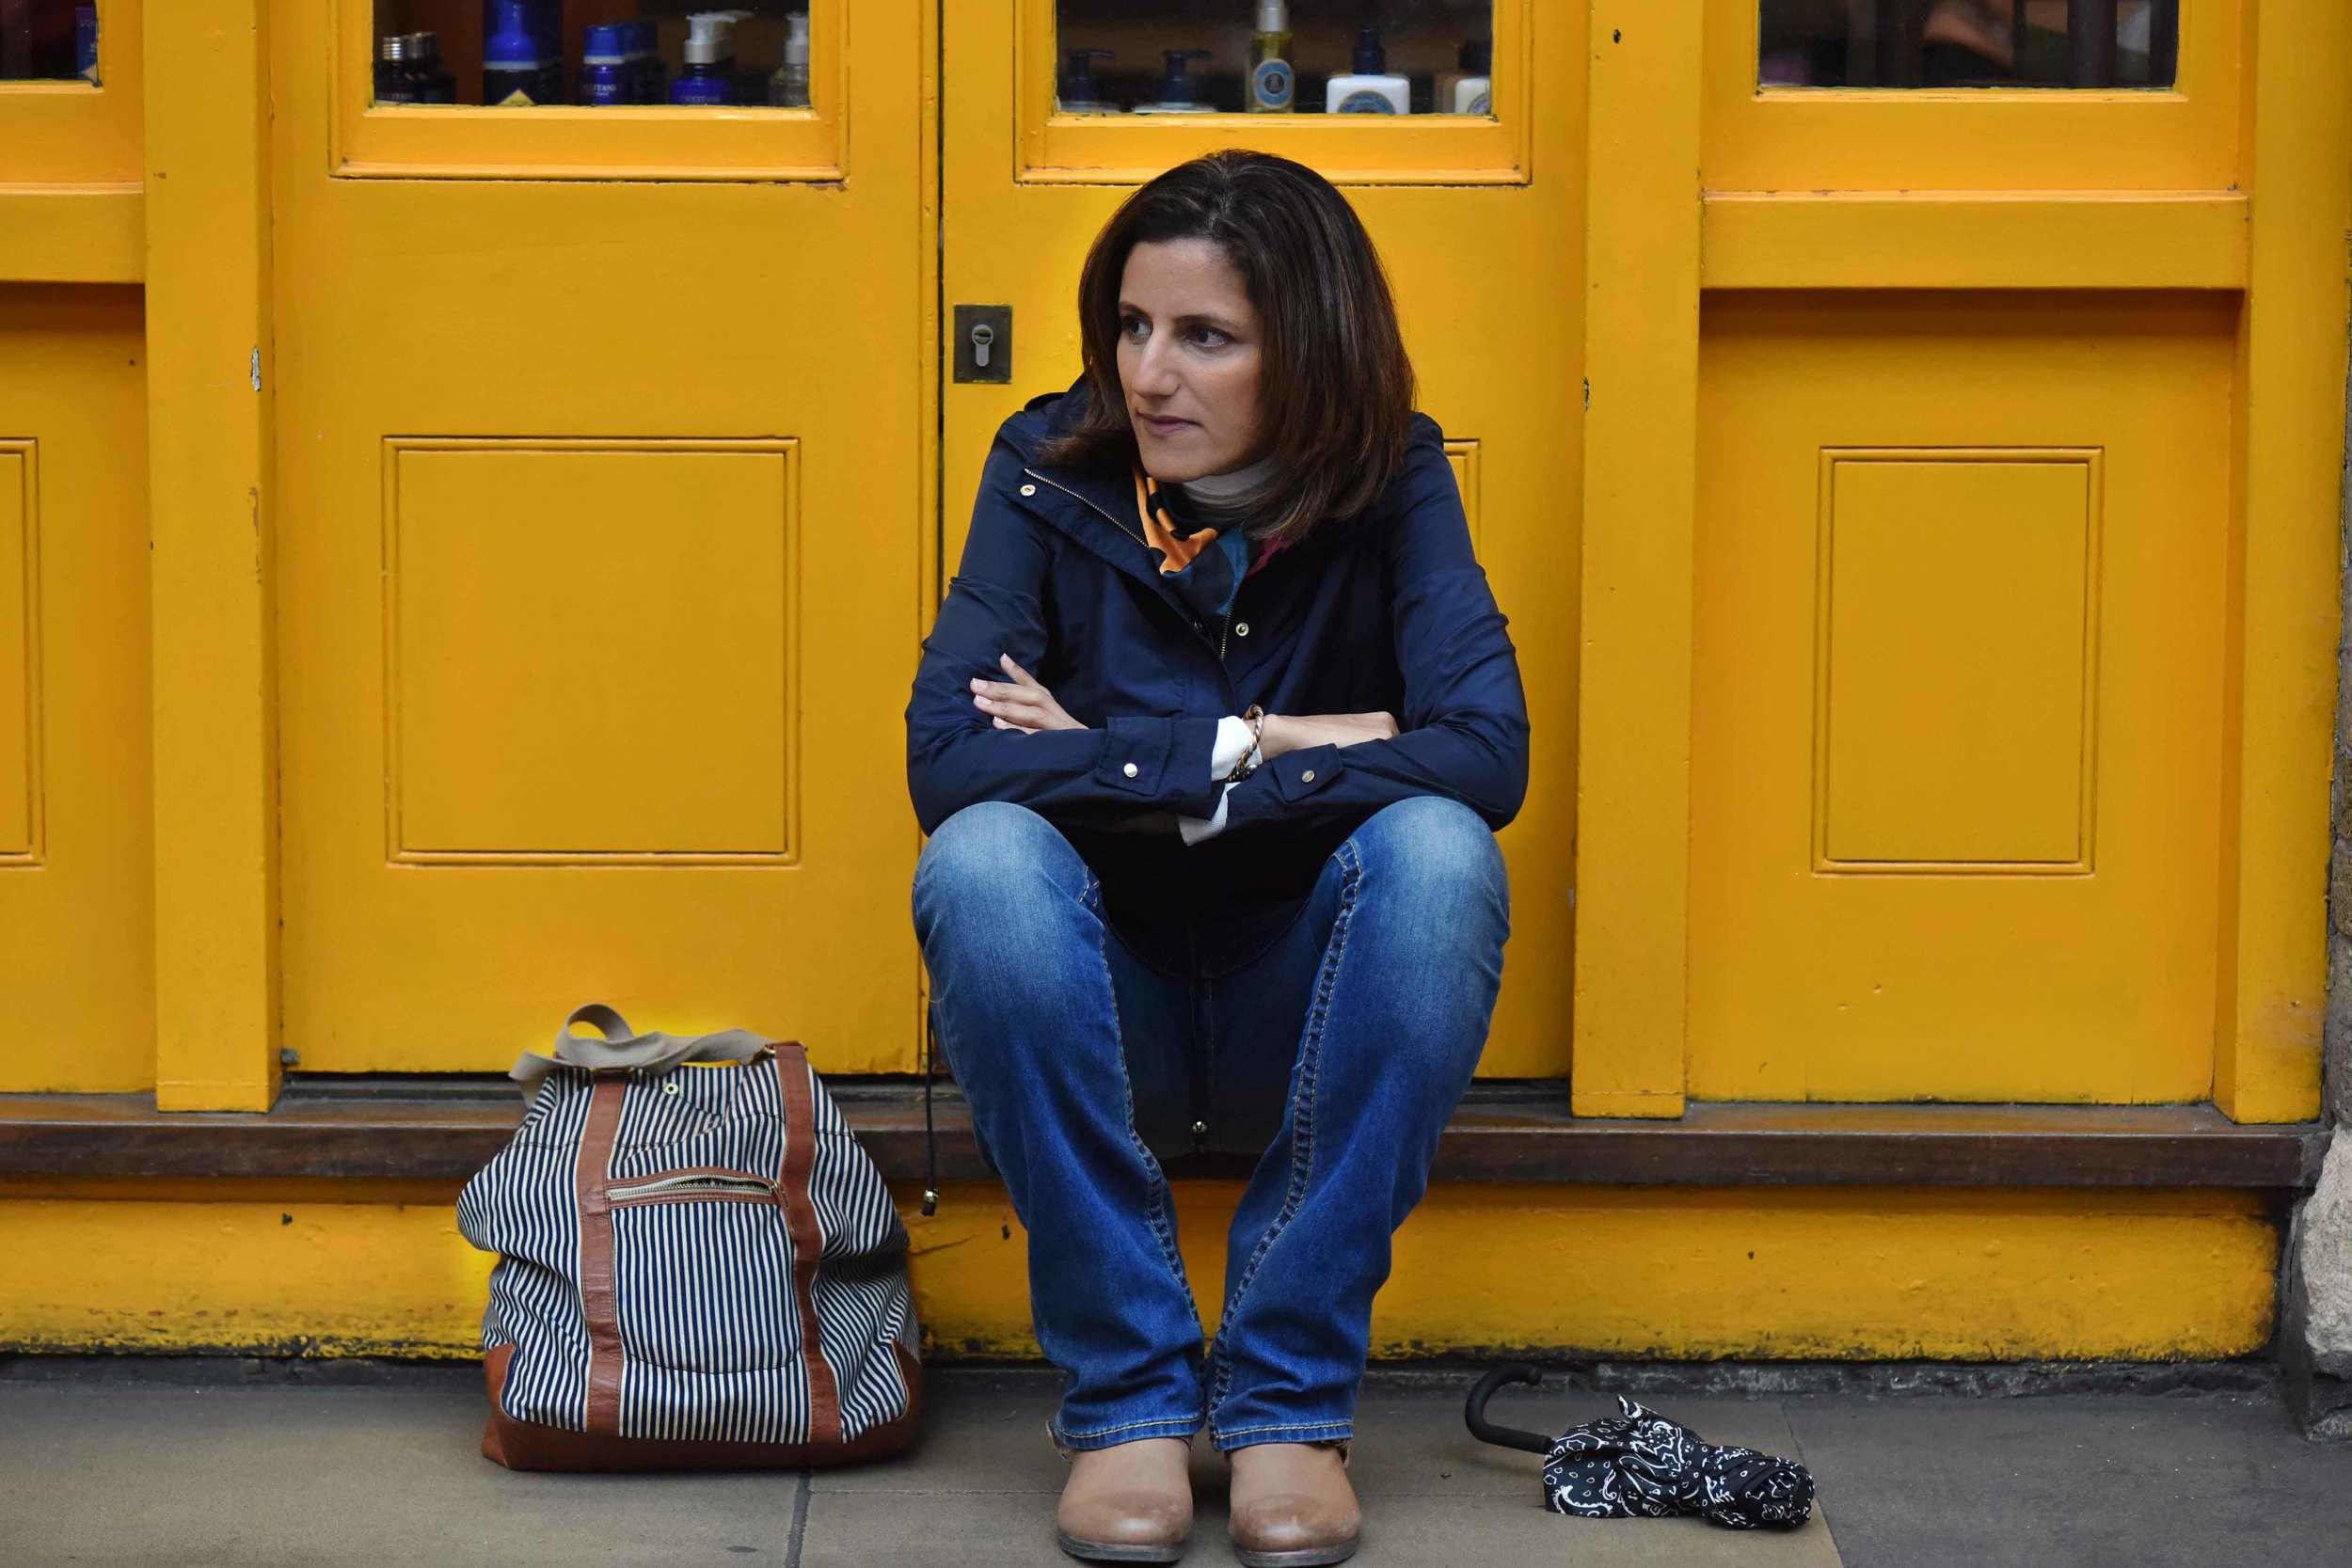 Zara water repellent jacket, Zara printed pocket square, Zara bandana print umbrella, True Religion jeans, Uggs boots, Apple Market, Covent Garden, London, UK. Image©sourcingstyle.com